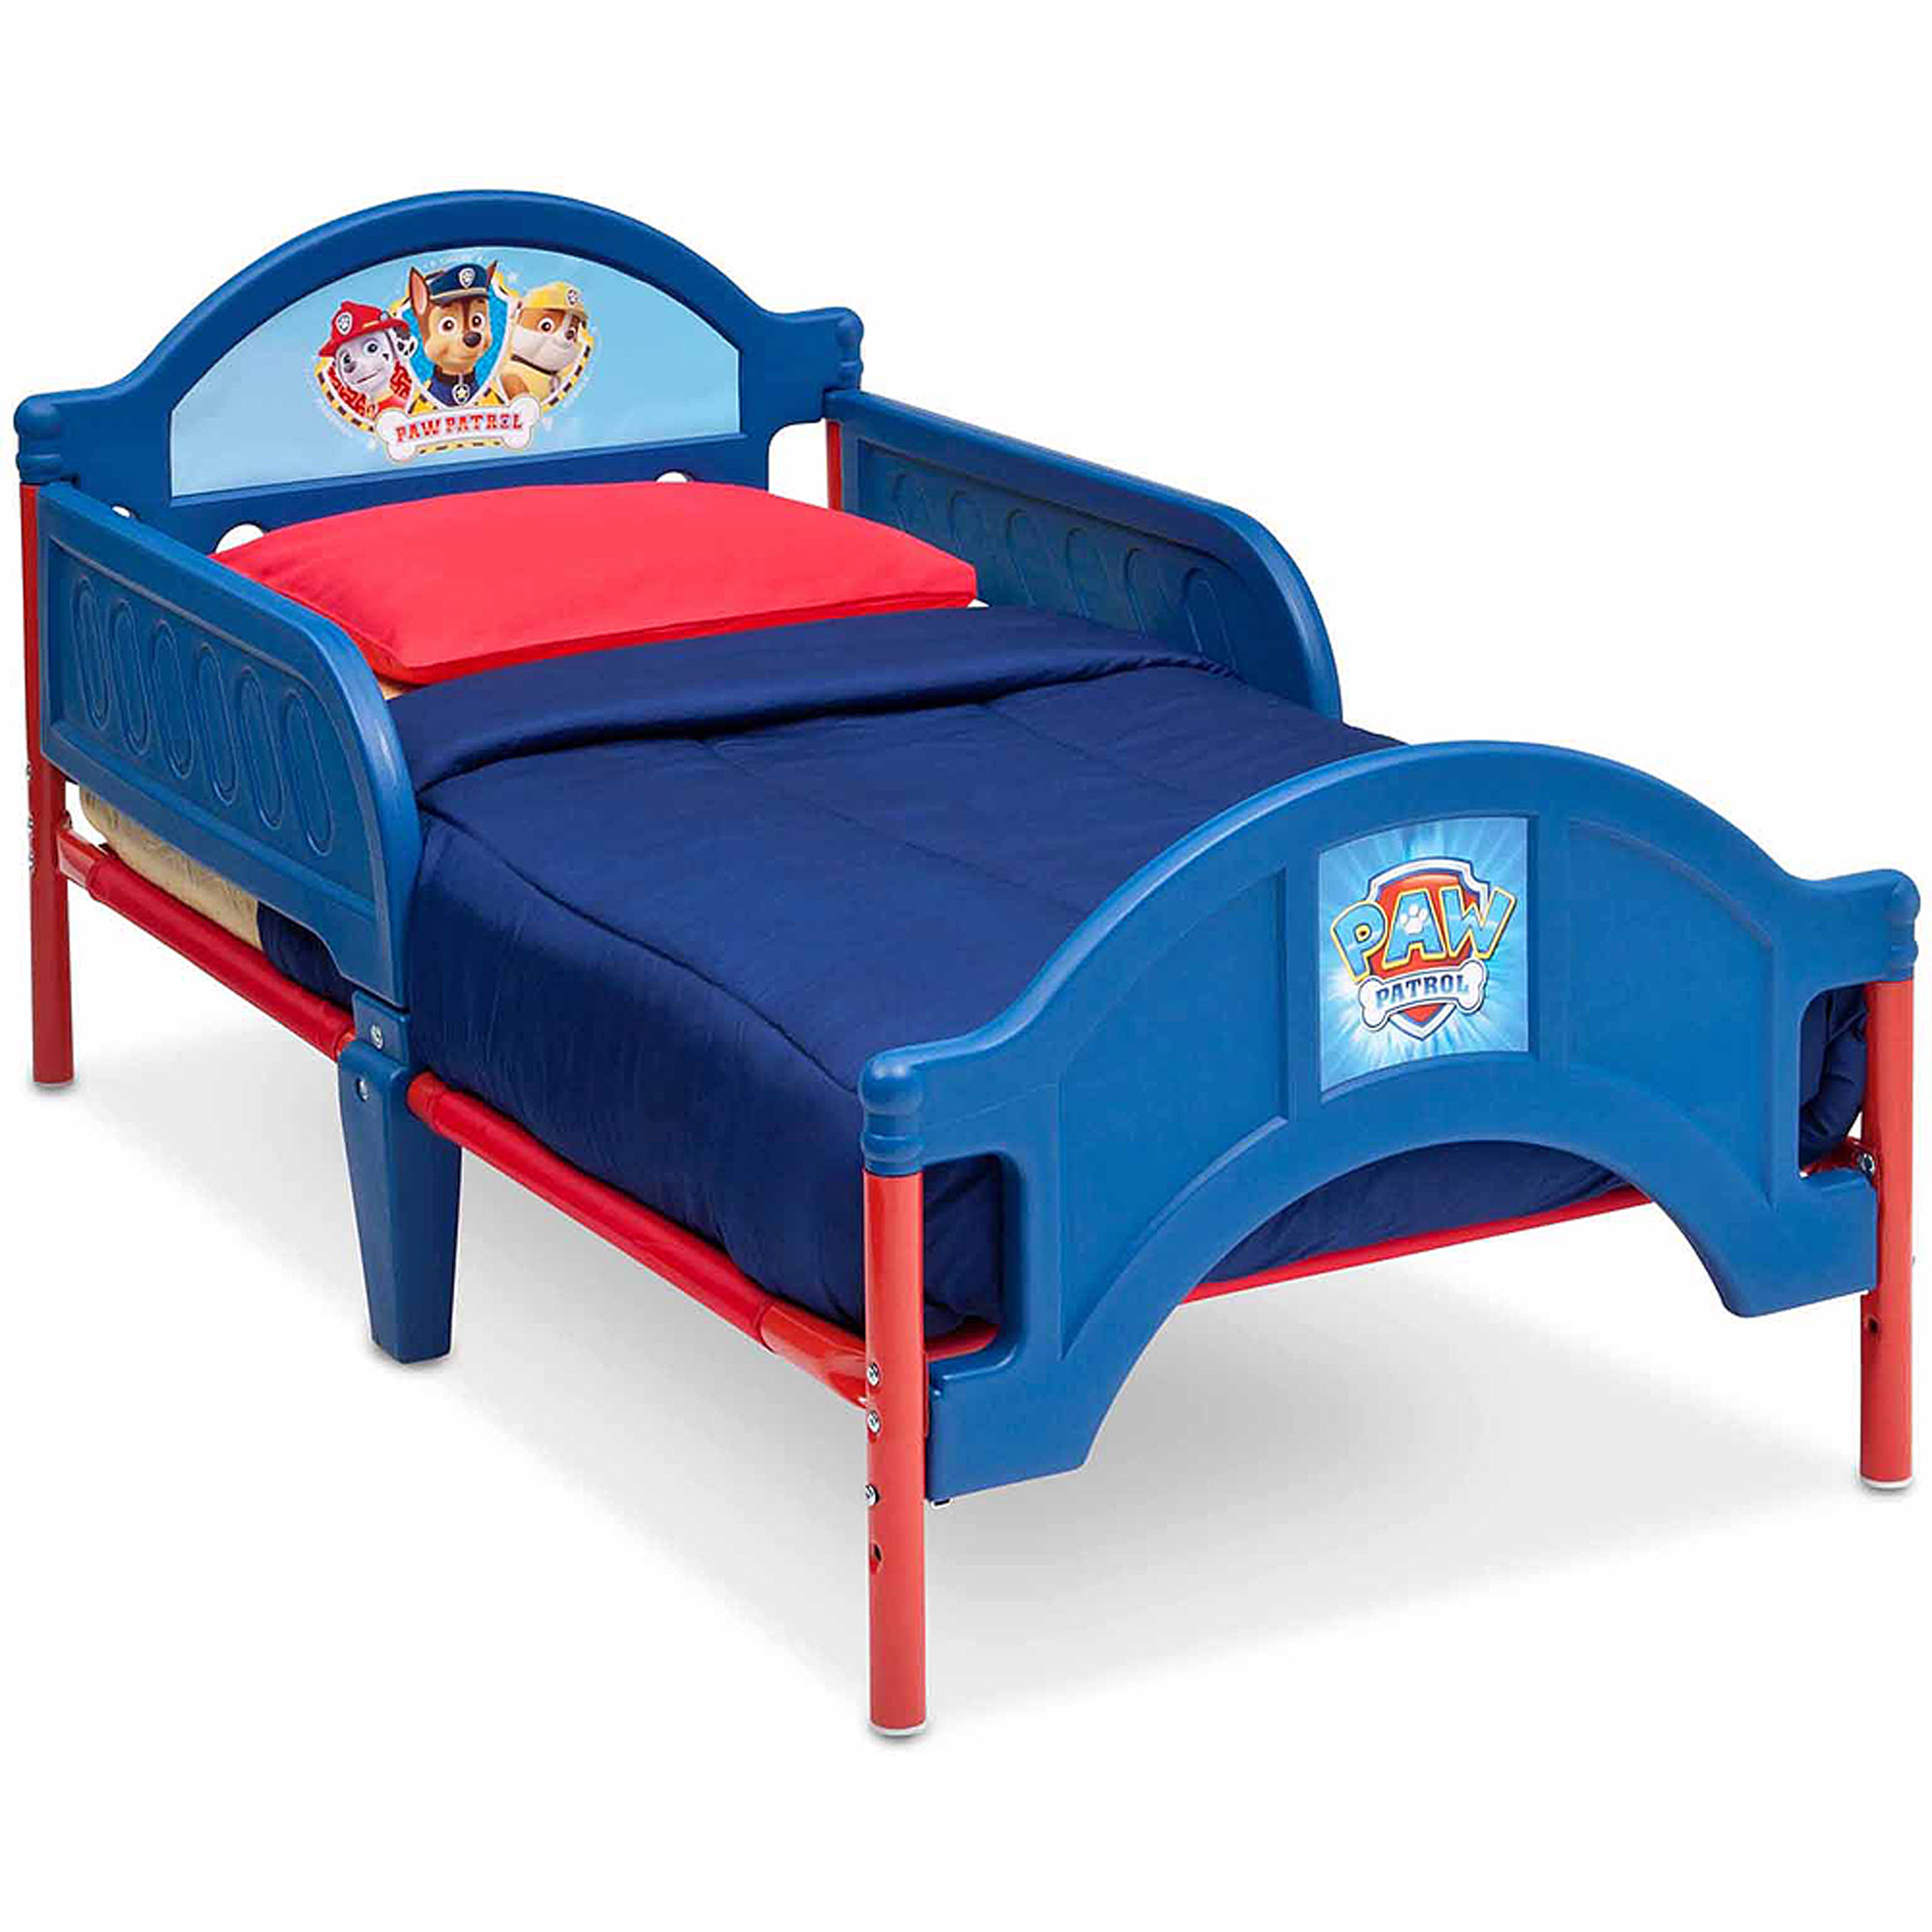 Nick Jr Paw Patrol Bedroom Set With Bonus Art Desk